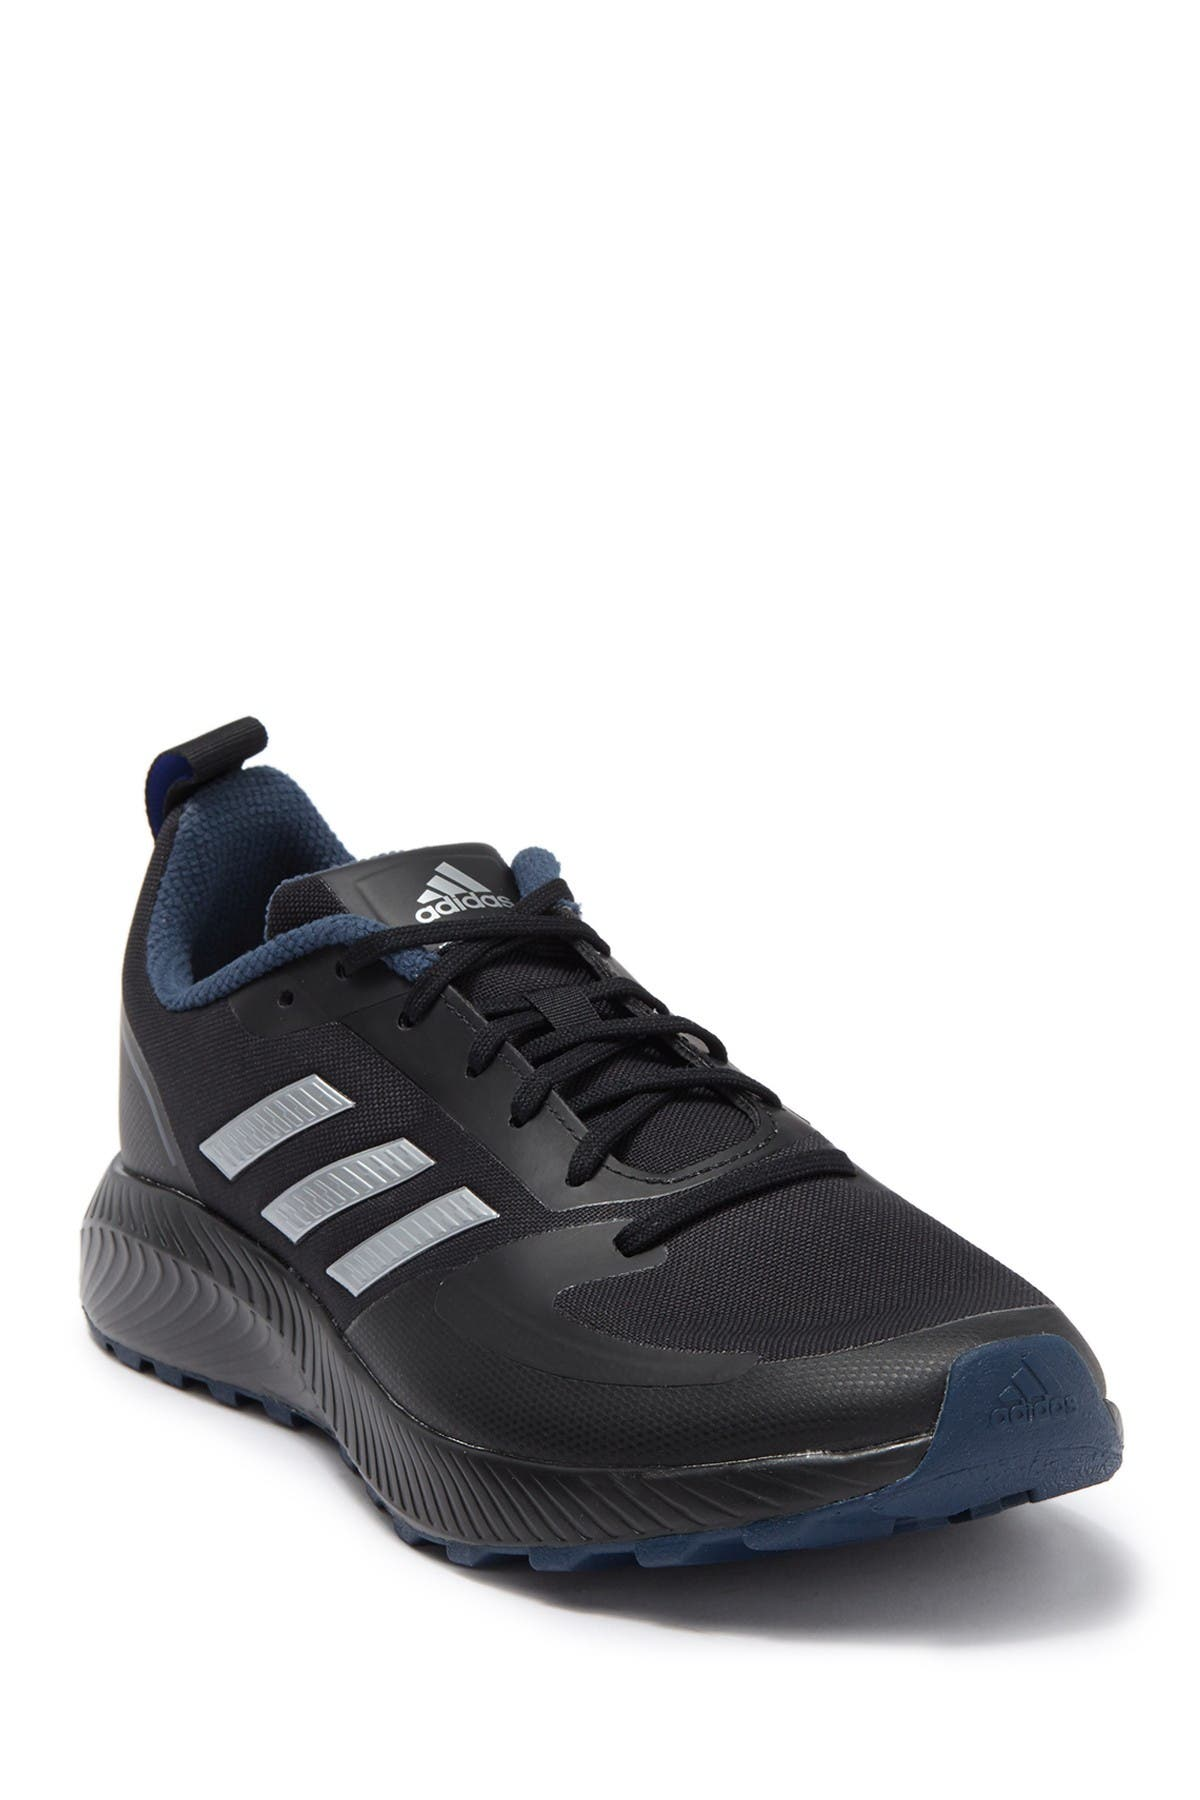 Image of adidas Runfalcon 2-0 TR Athletic Sneaker